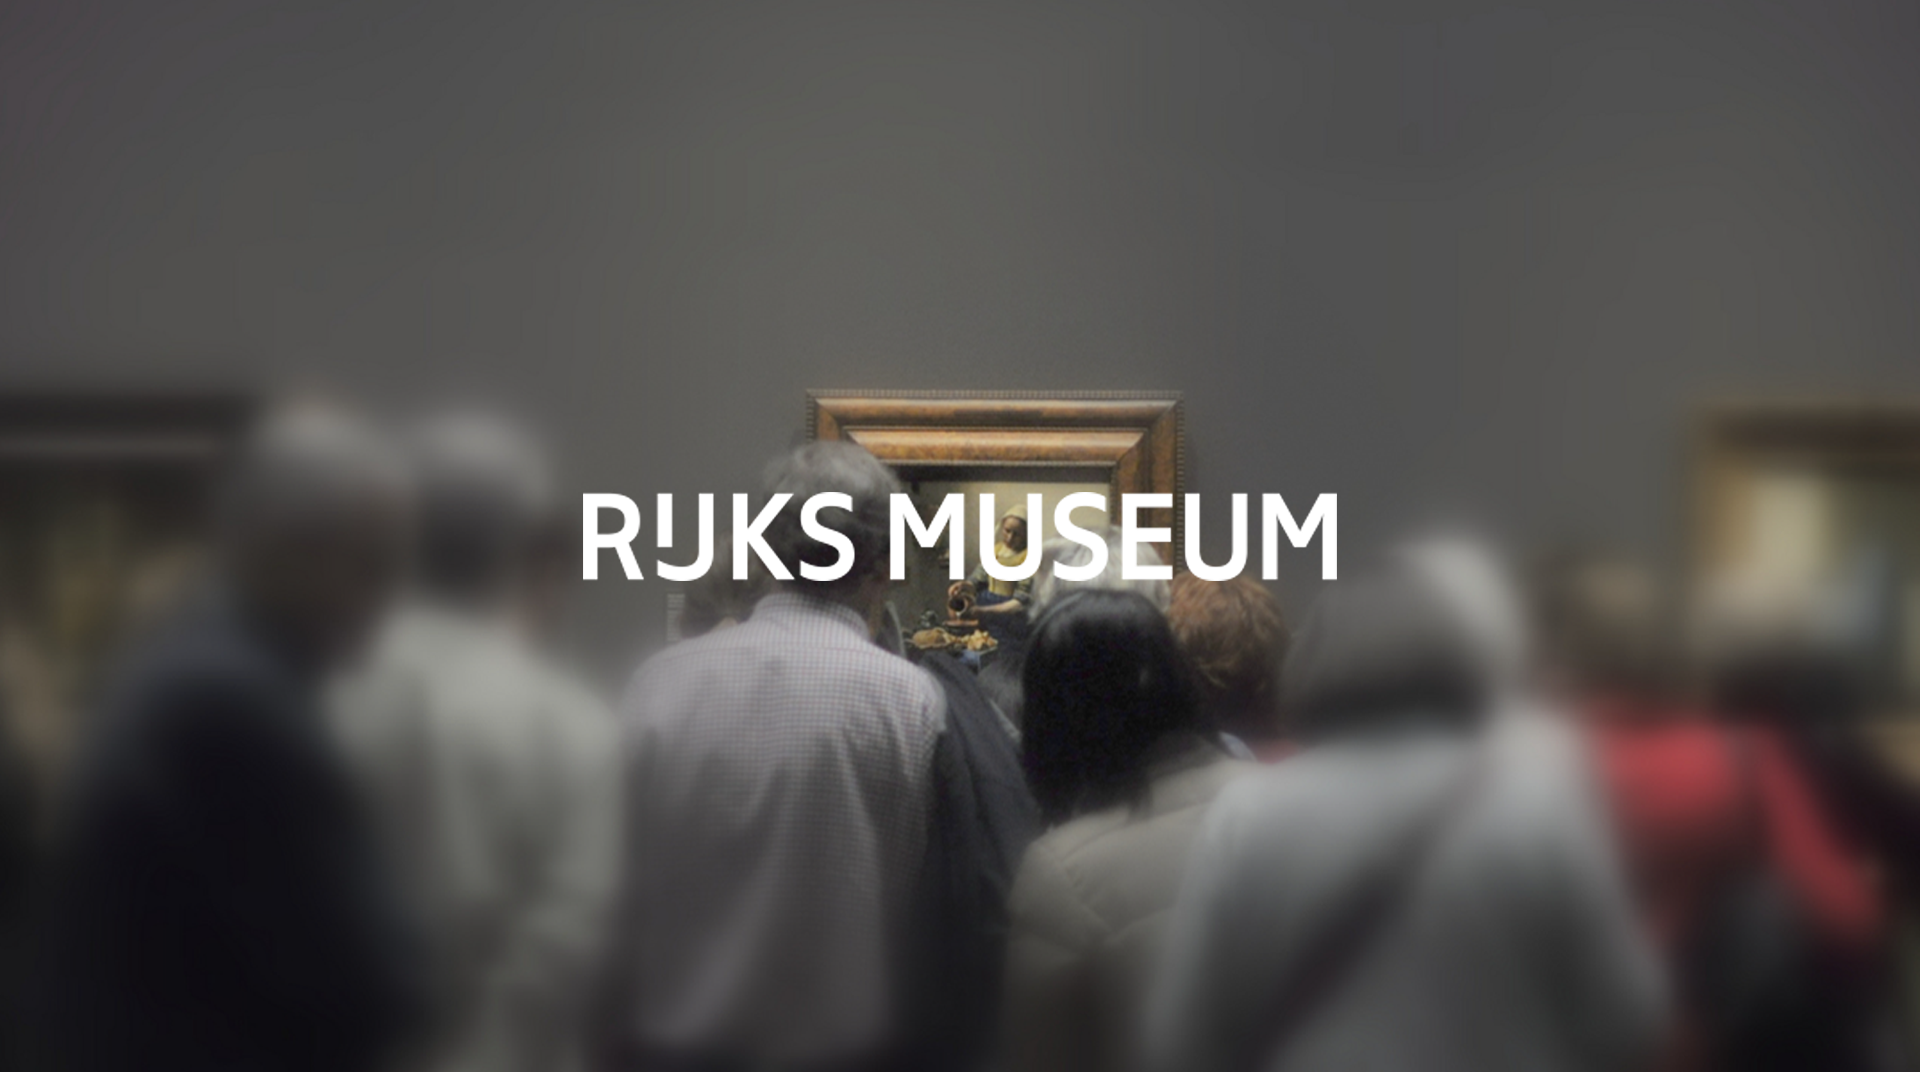 Rijks Museum | CRM strategy en omnichannel marketing plan gericht op bezoekersloyaliteit